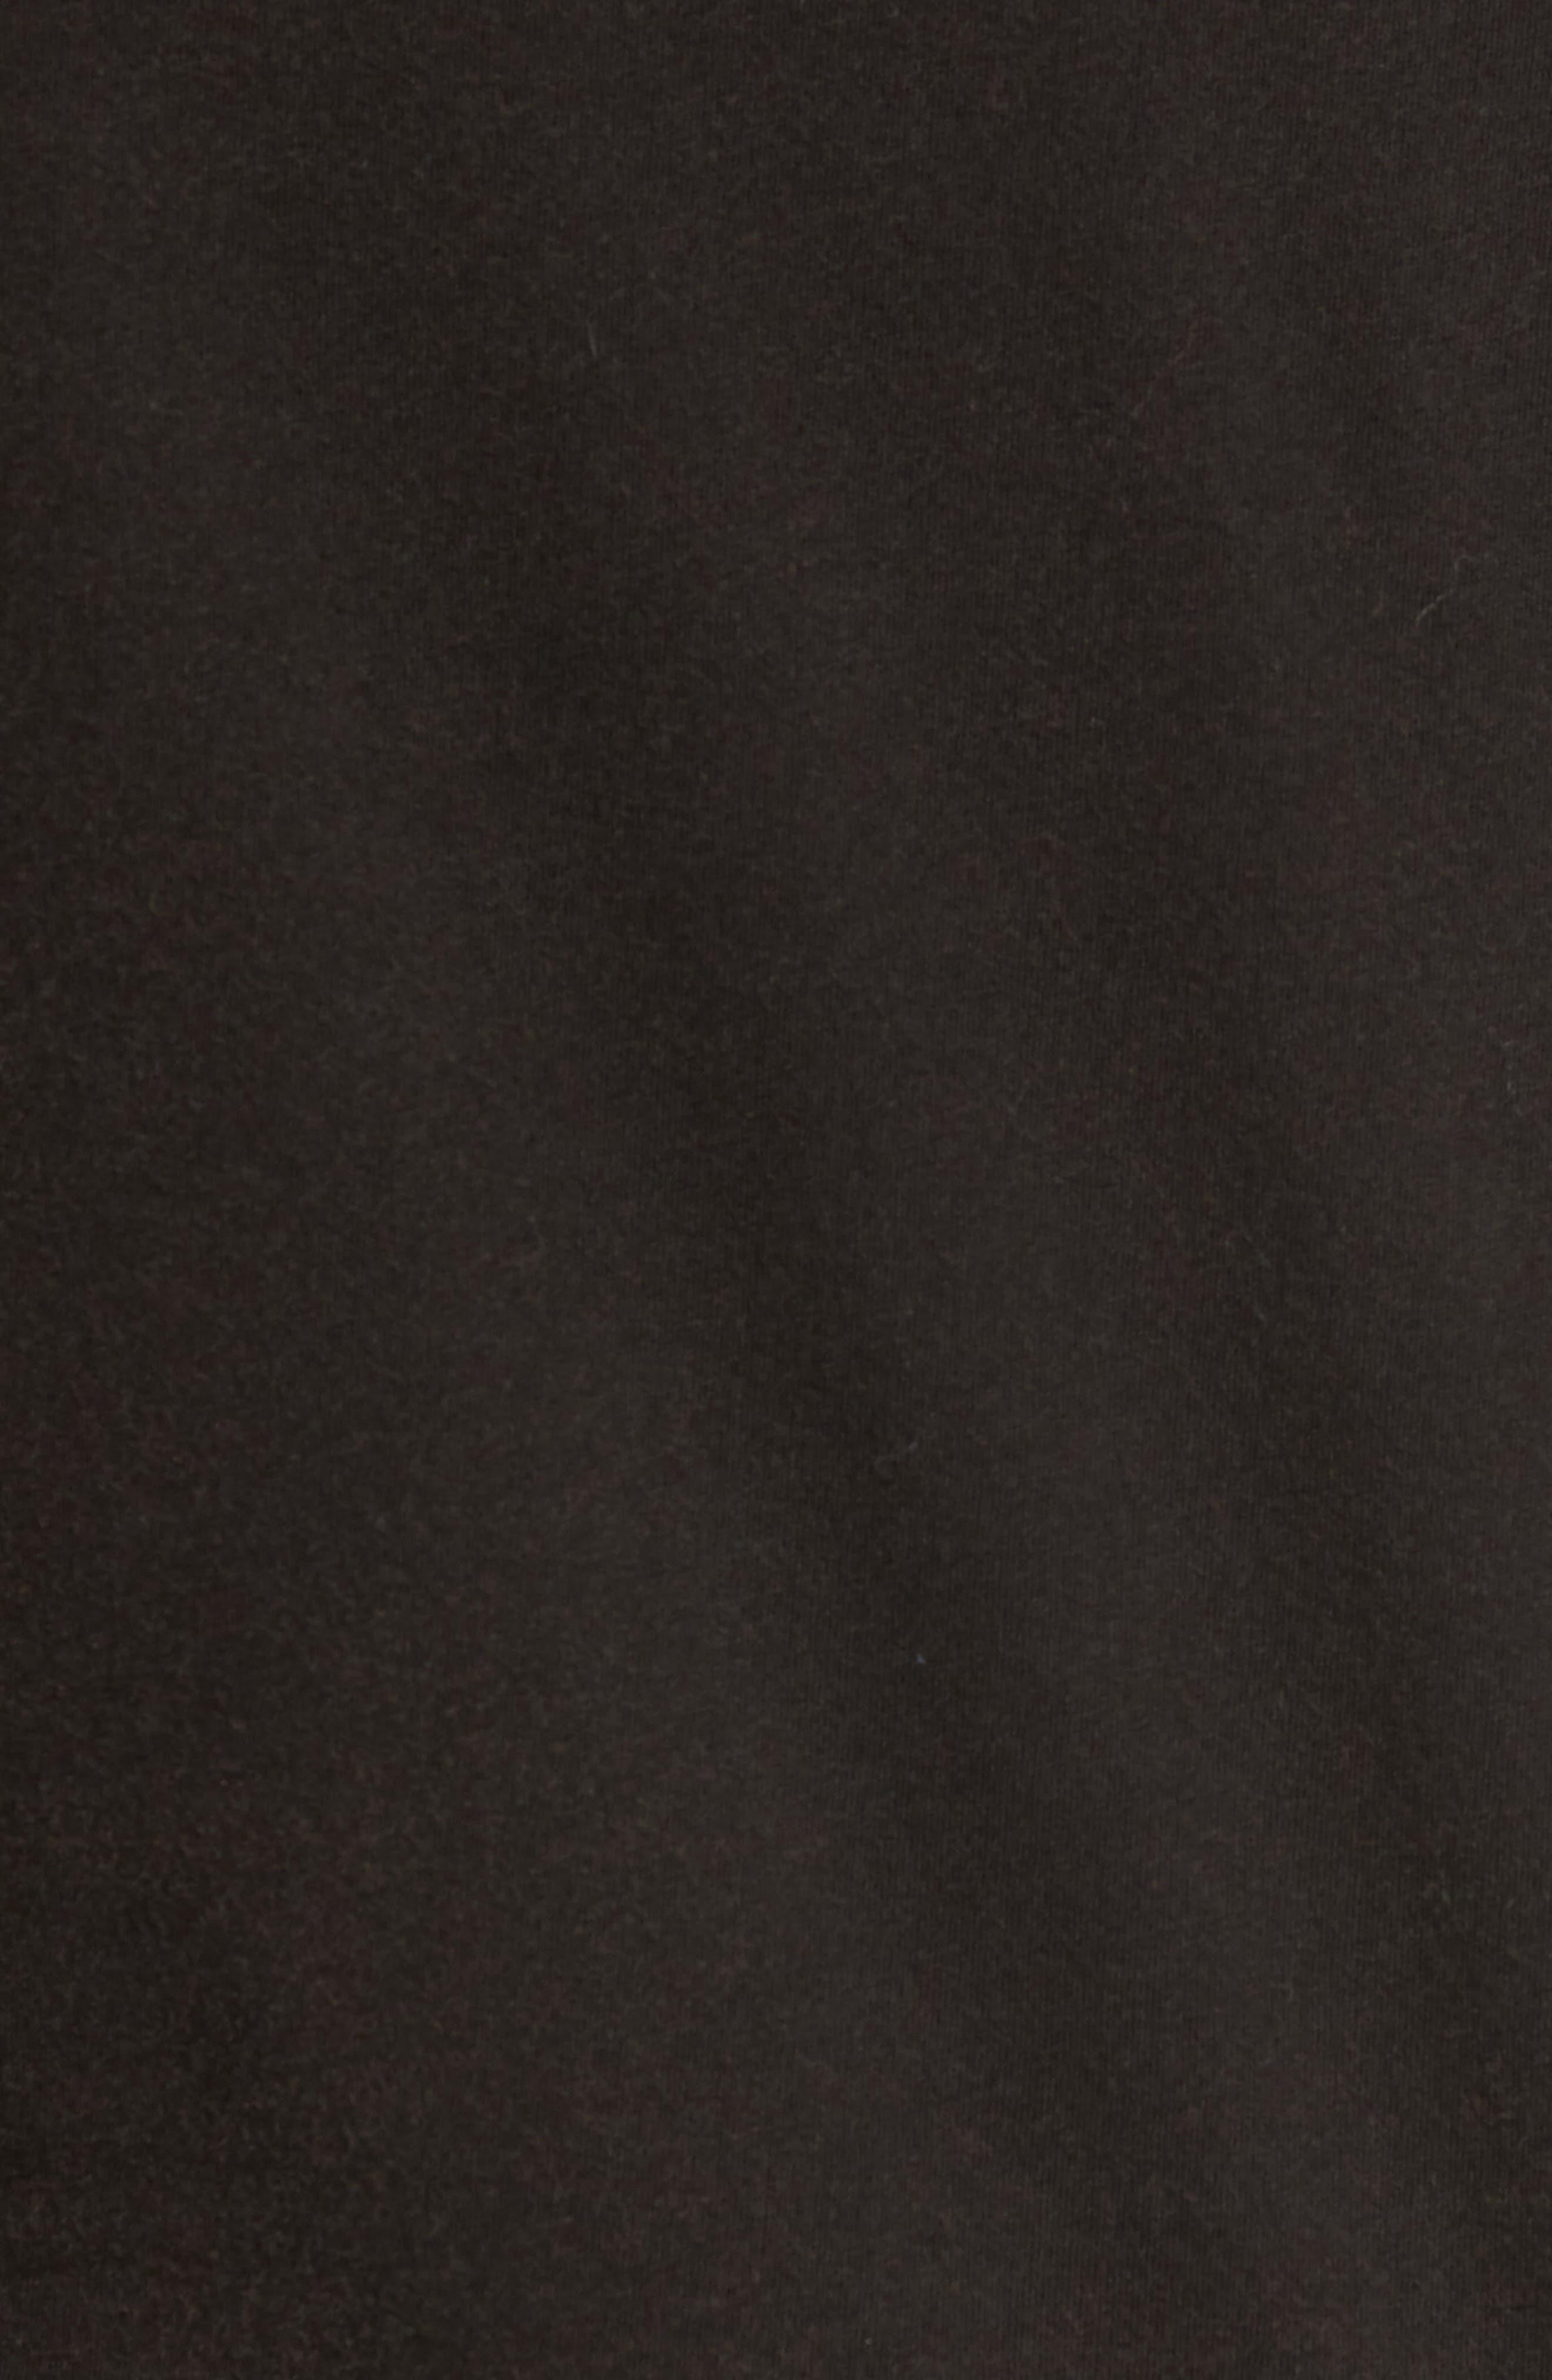 Def Leppard Graphic T-Shirt,                             Alternate thumbnail 5, color,                             001